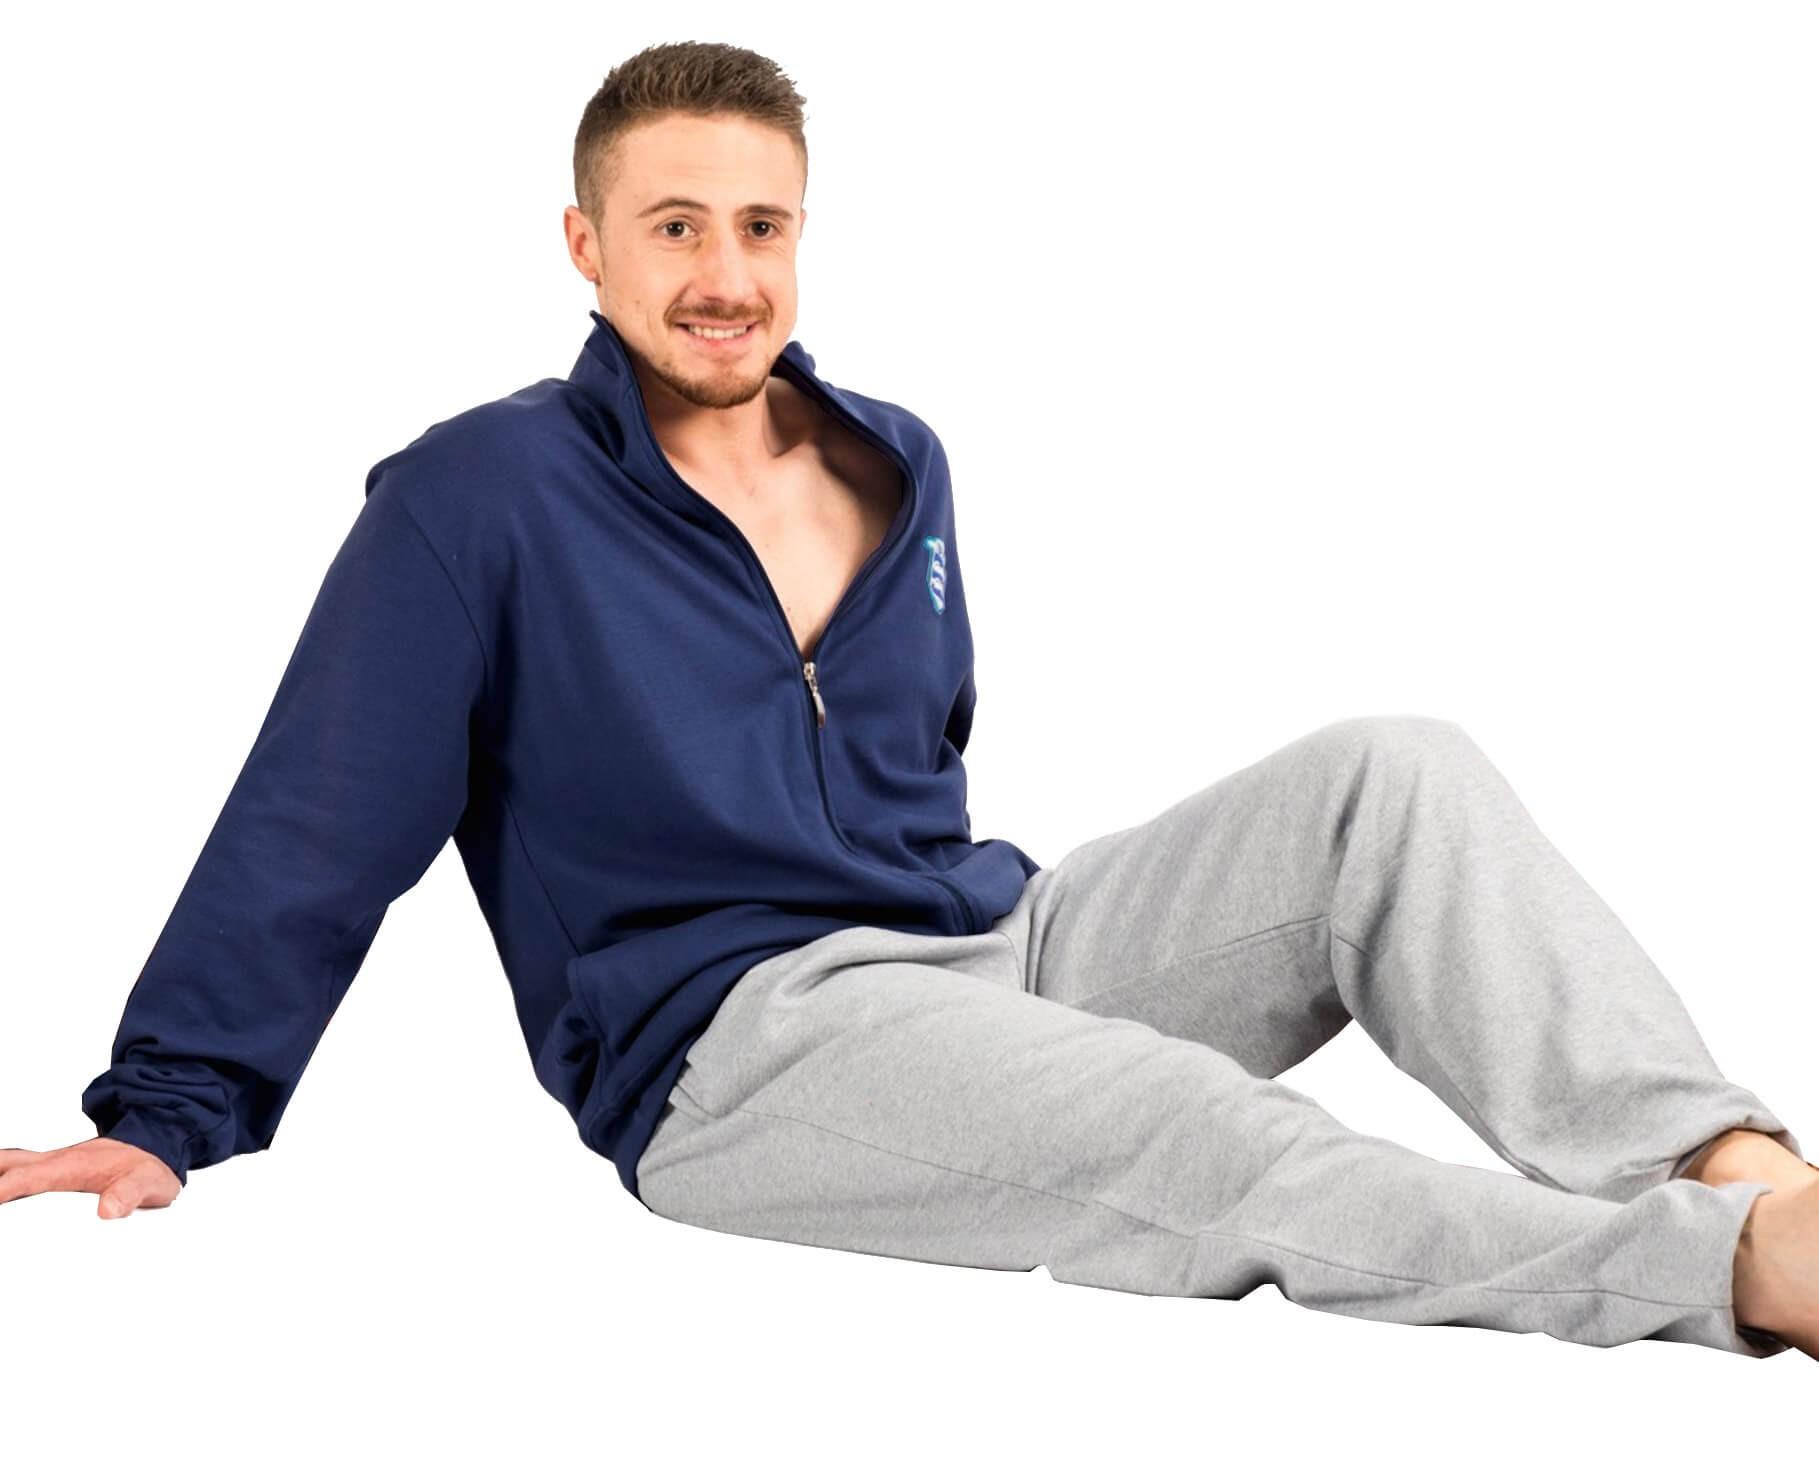 Contro Senso βαμβακερή αντρική χειμωνιάτικη πυτζάμα navy ζακέτα & γκρι μελανζέ παντελόνι κωδ.S2G_U6680